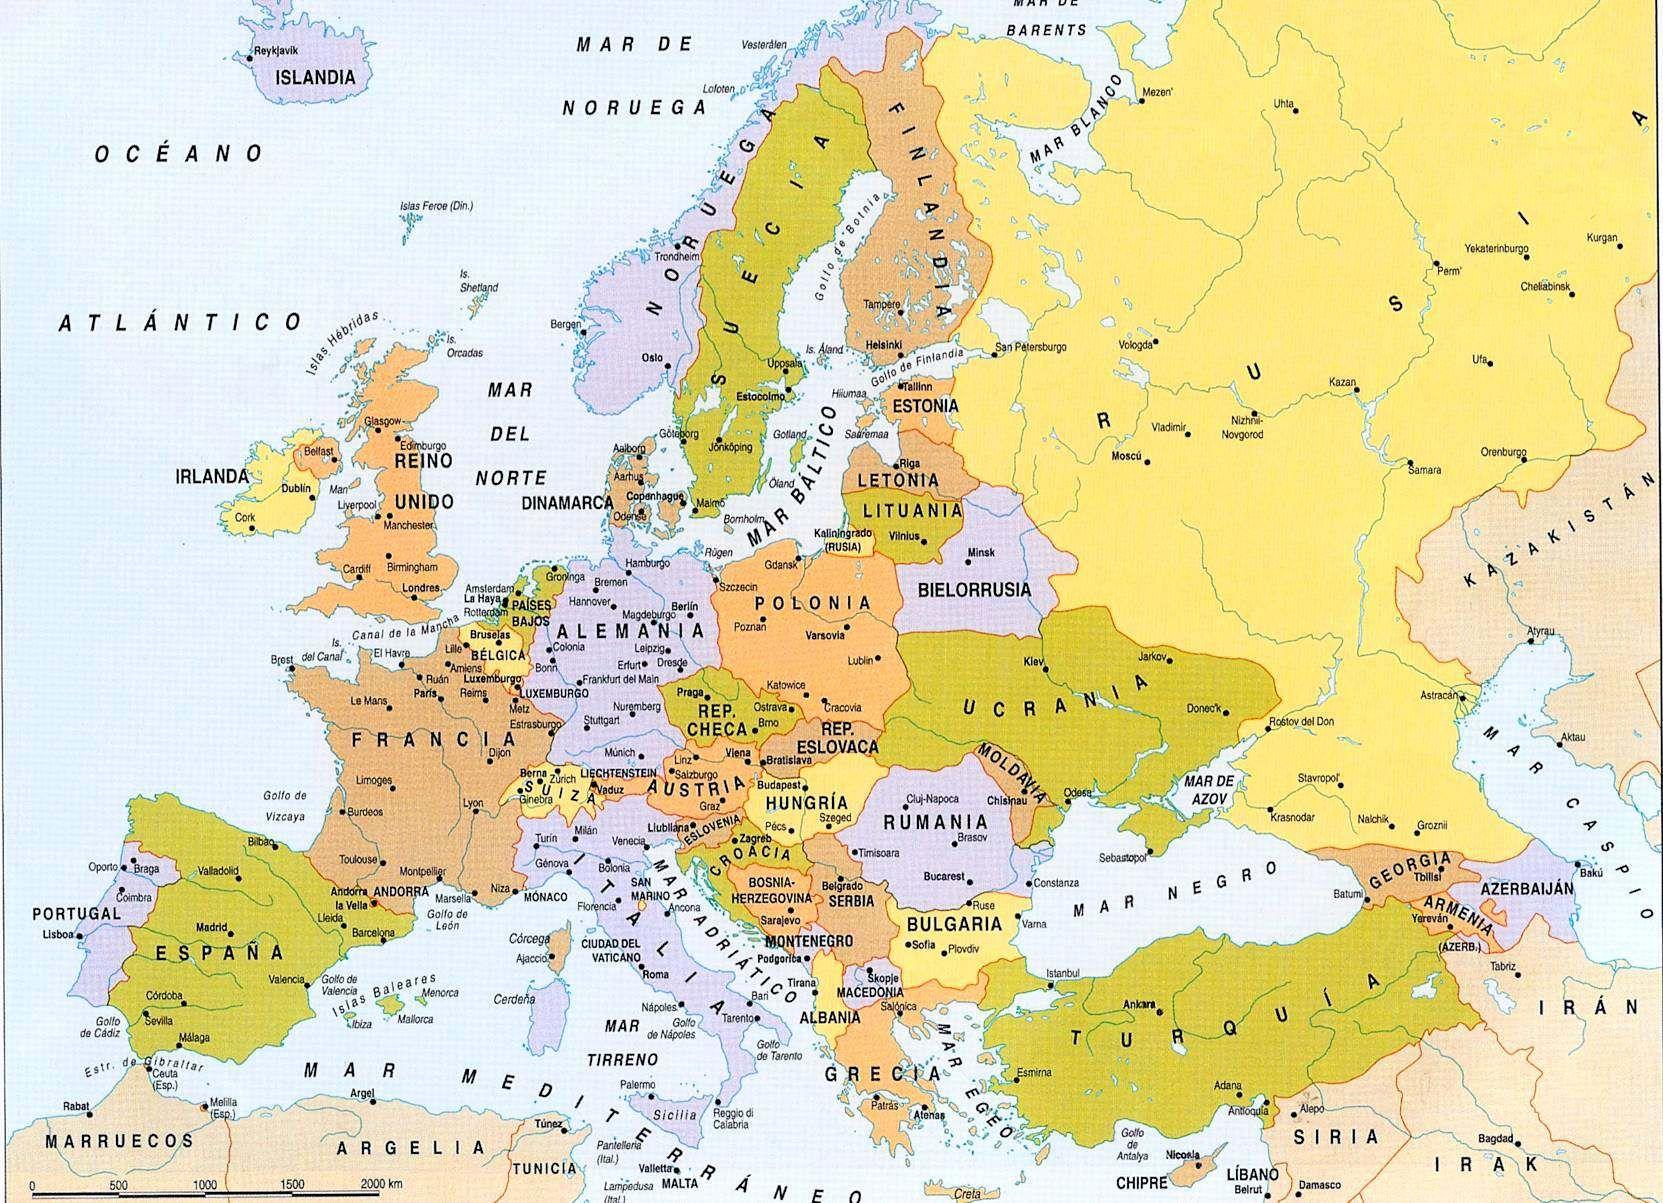 Mapa Politico De Europa Grande Asia Africa Oceania America Online